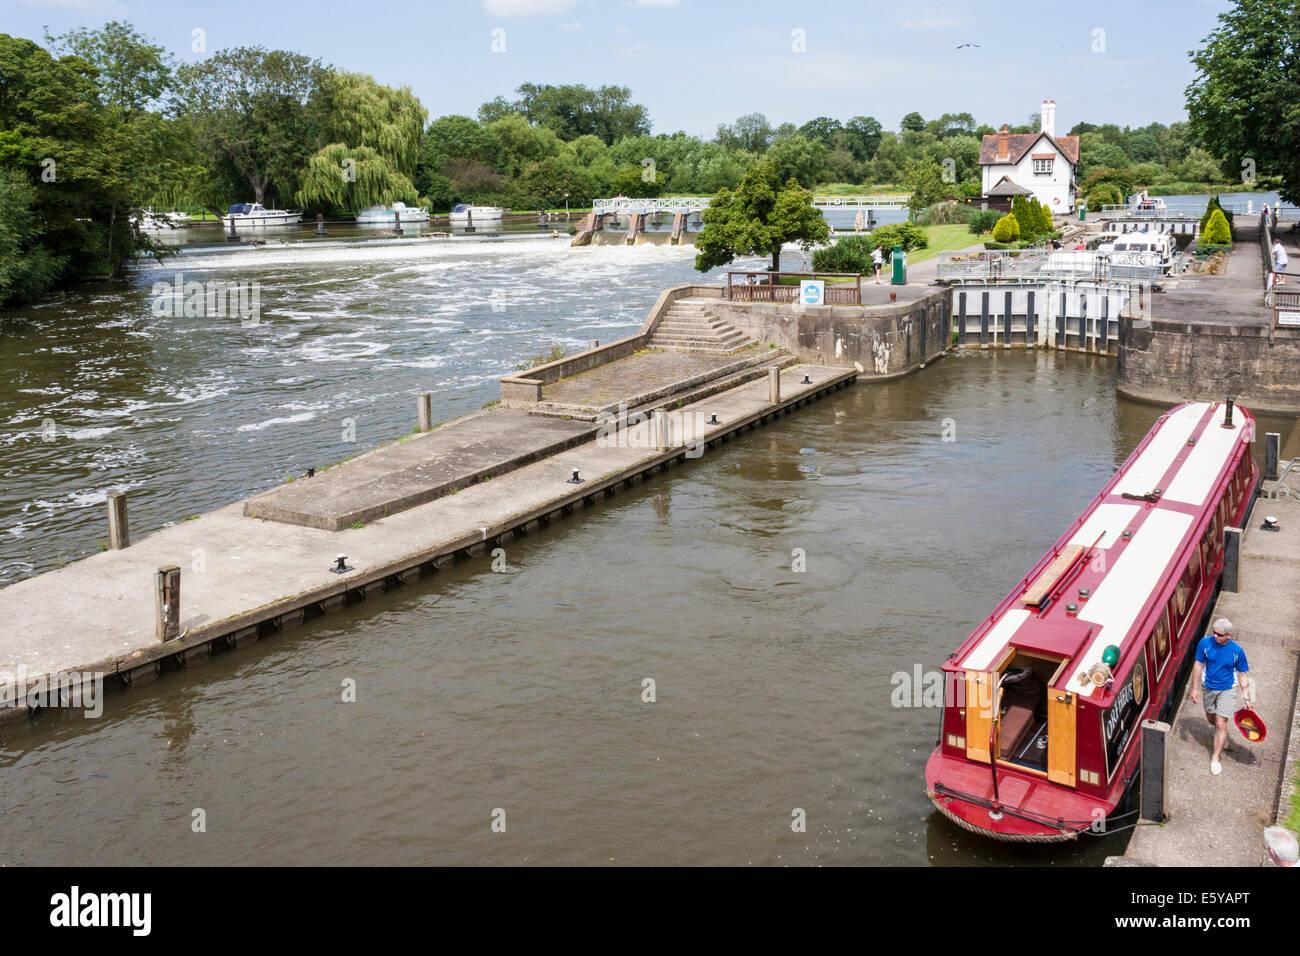 Goring Lock, Goring-on-Thames, Oxfordshire, England, GB, UK. Stock Photo